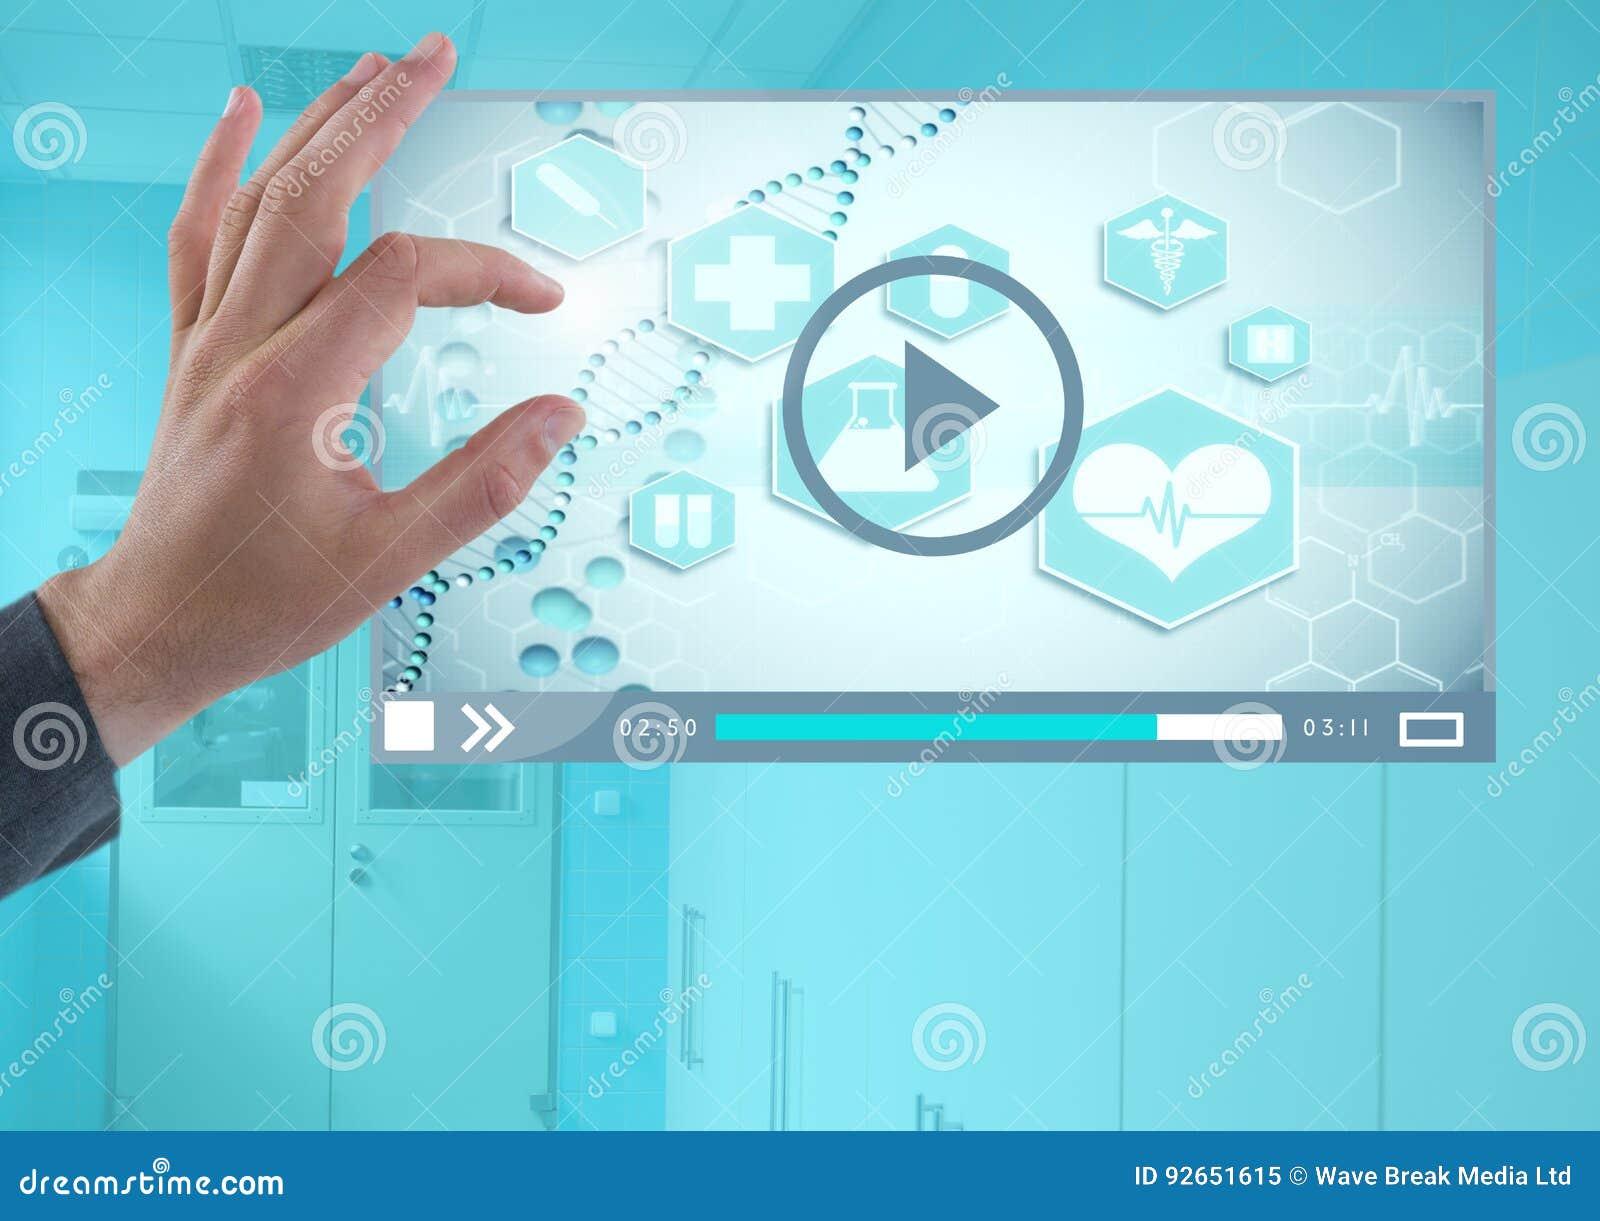 Handrührende medizinische Video-Player-APP-Schnittstelle